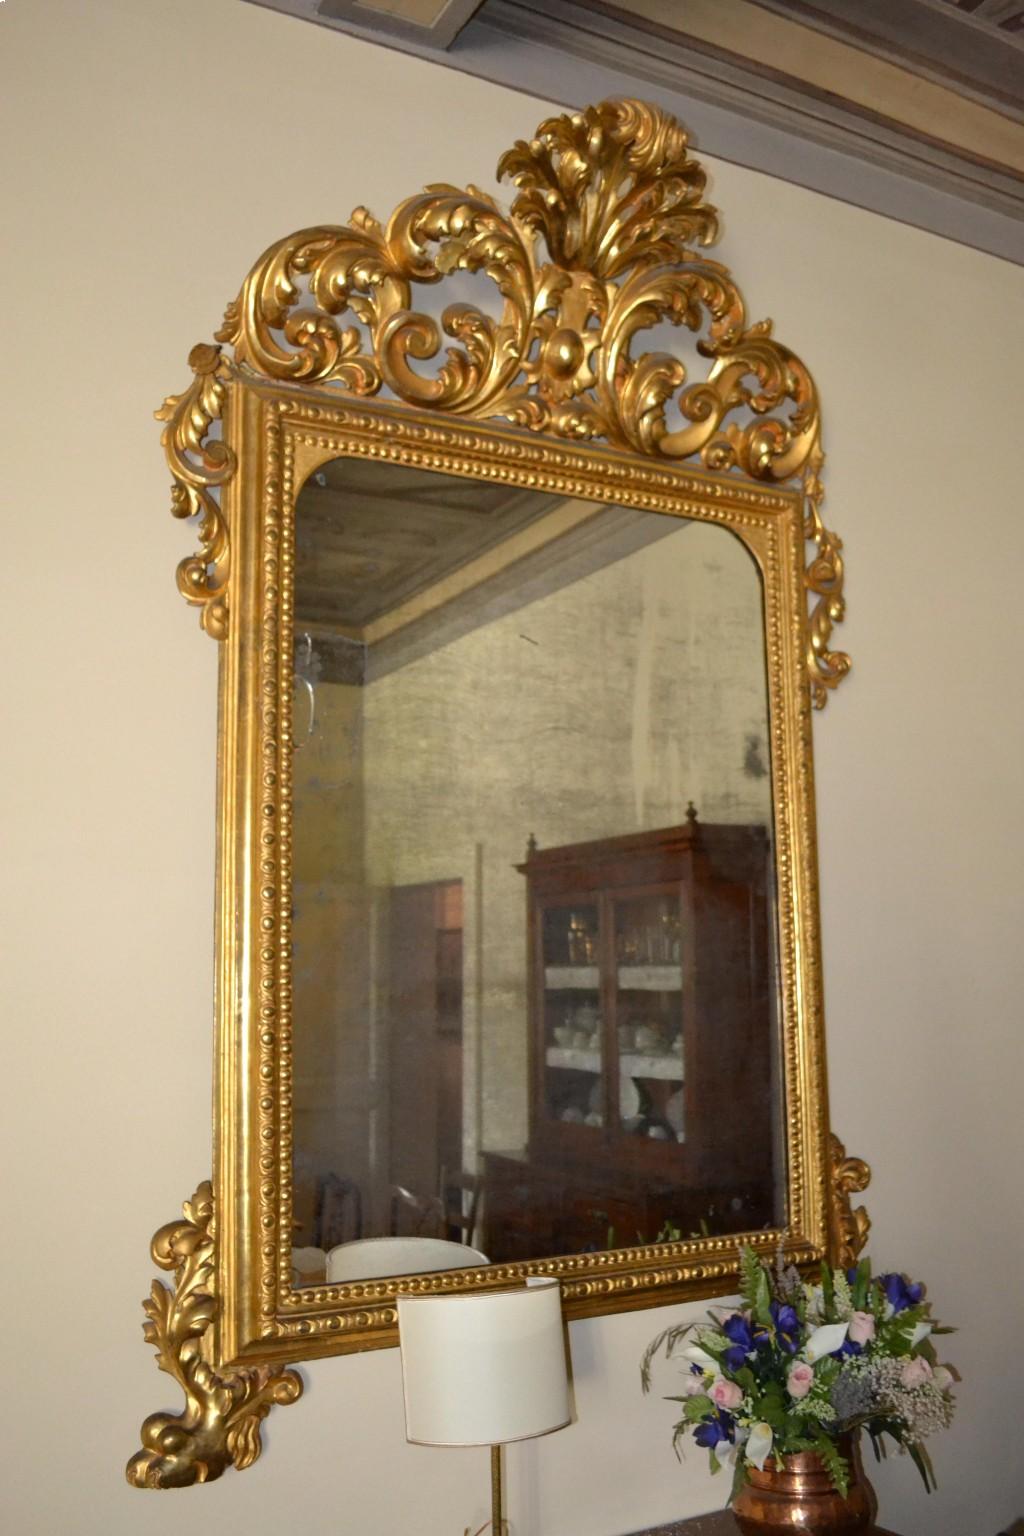 restauri, mobili - arredamenti su misura, restauri, antiquariato - Mobili Antichi Restaurati Moderni